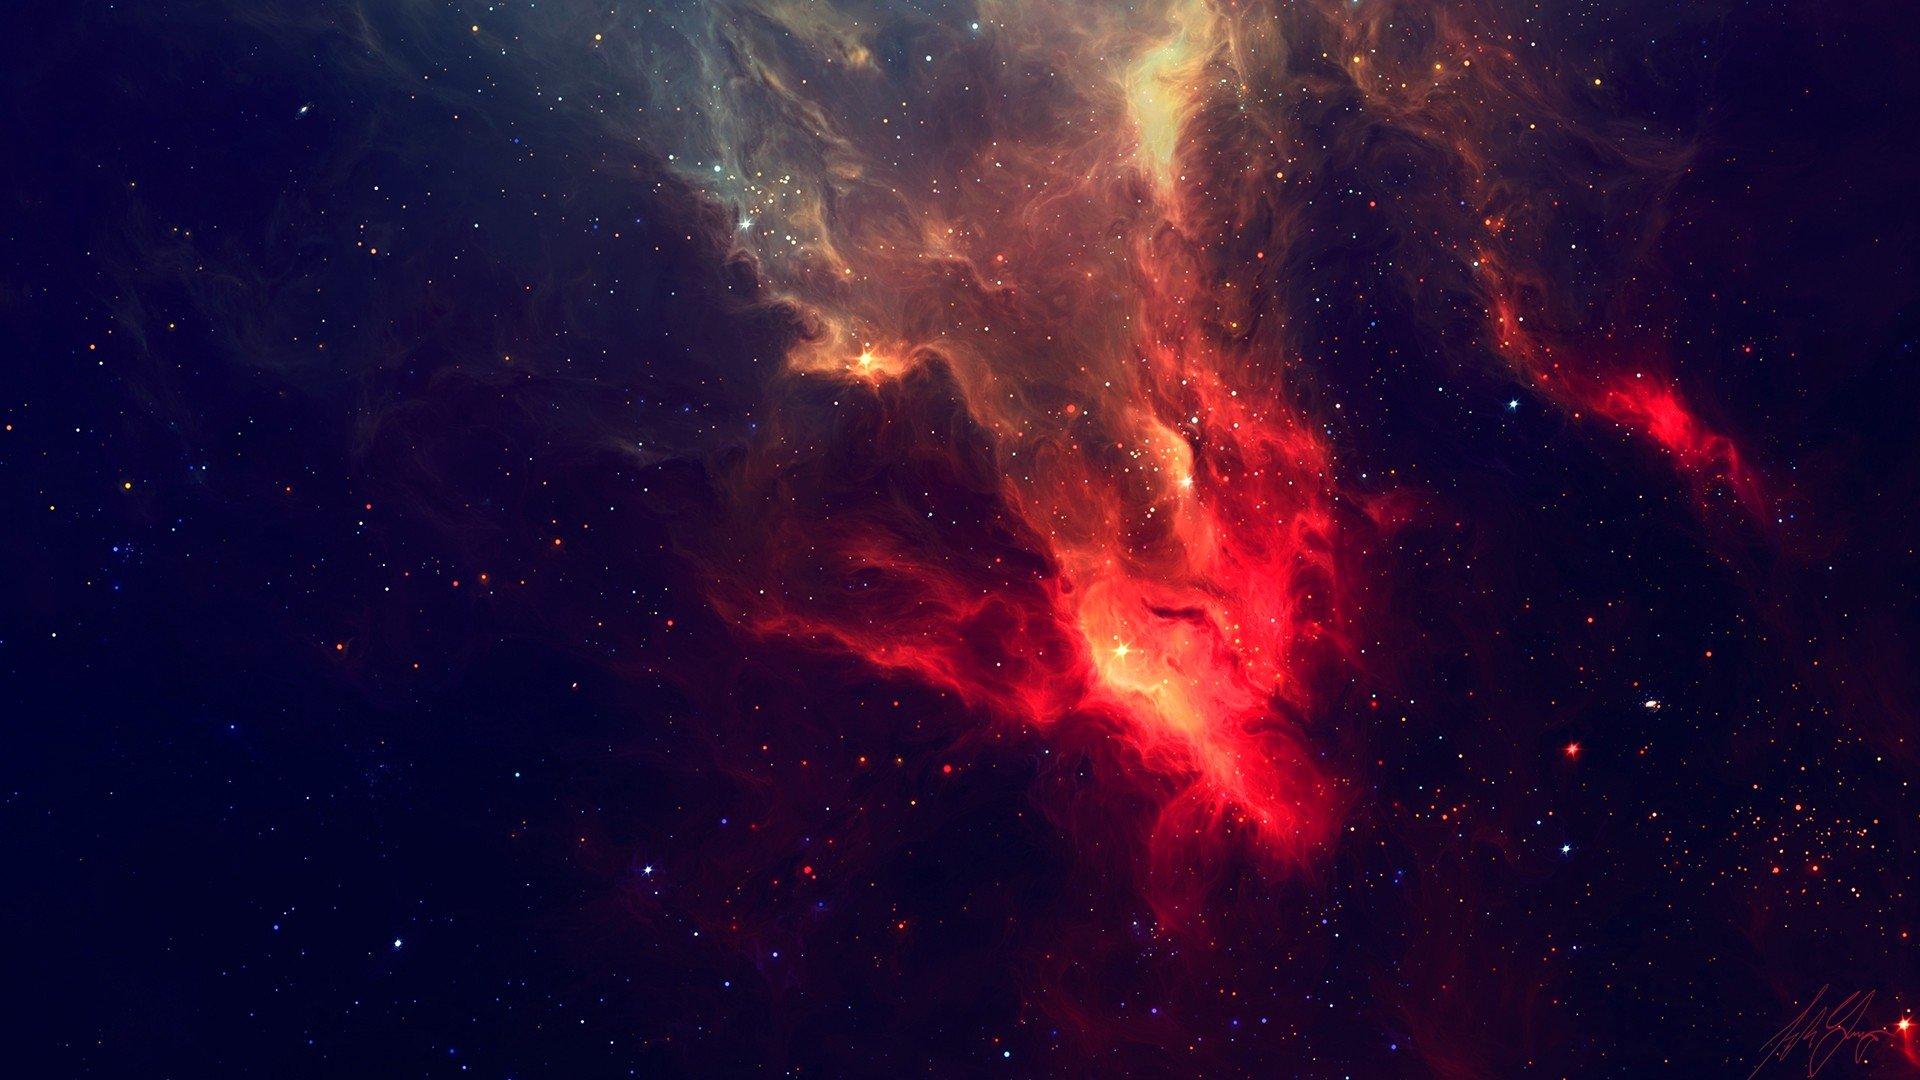 Hd wallpaper galaxy - Galaxy Wallpapers 6